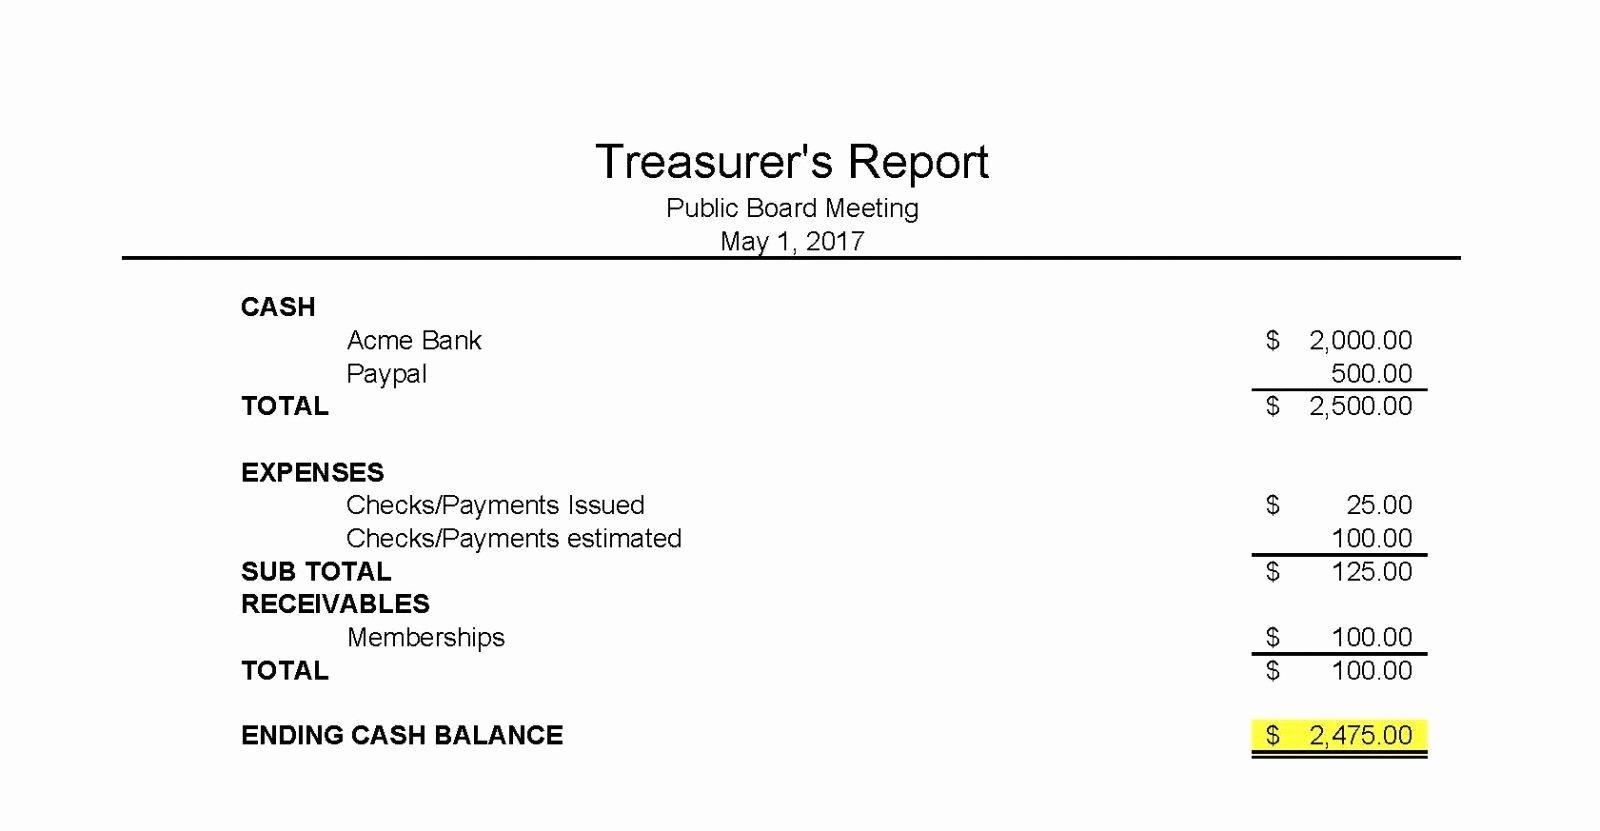 Treasurer Report Template Non Profit New Treasurers Report Templateasurer Essential Print S Maggi